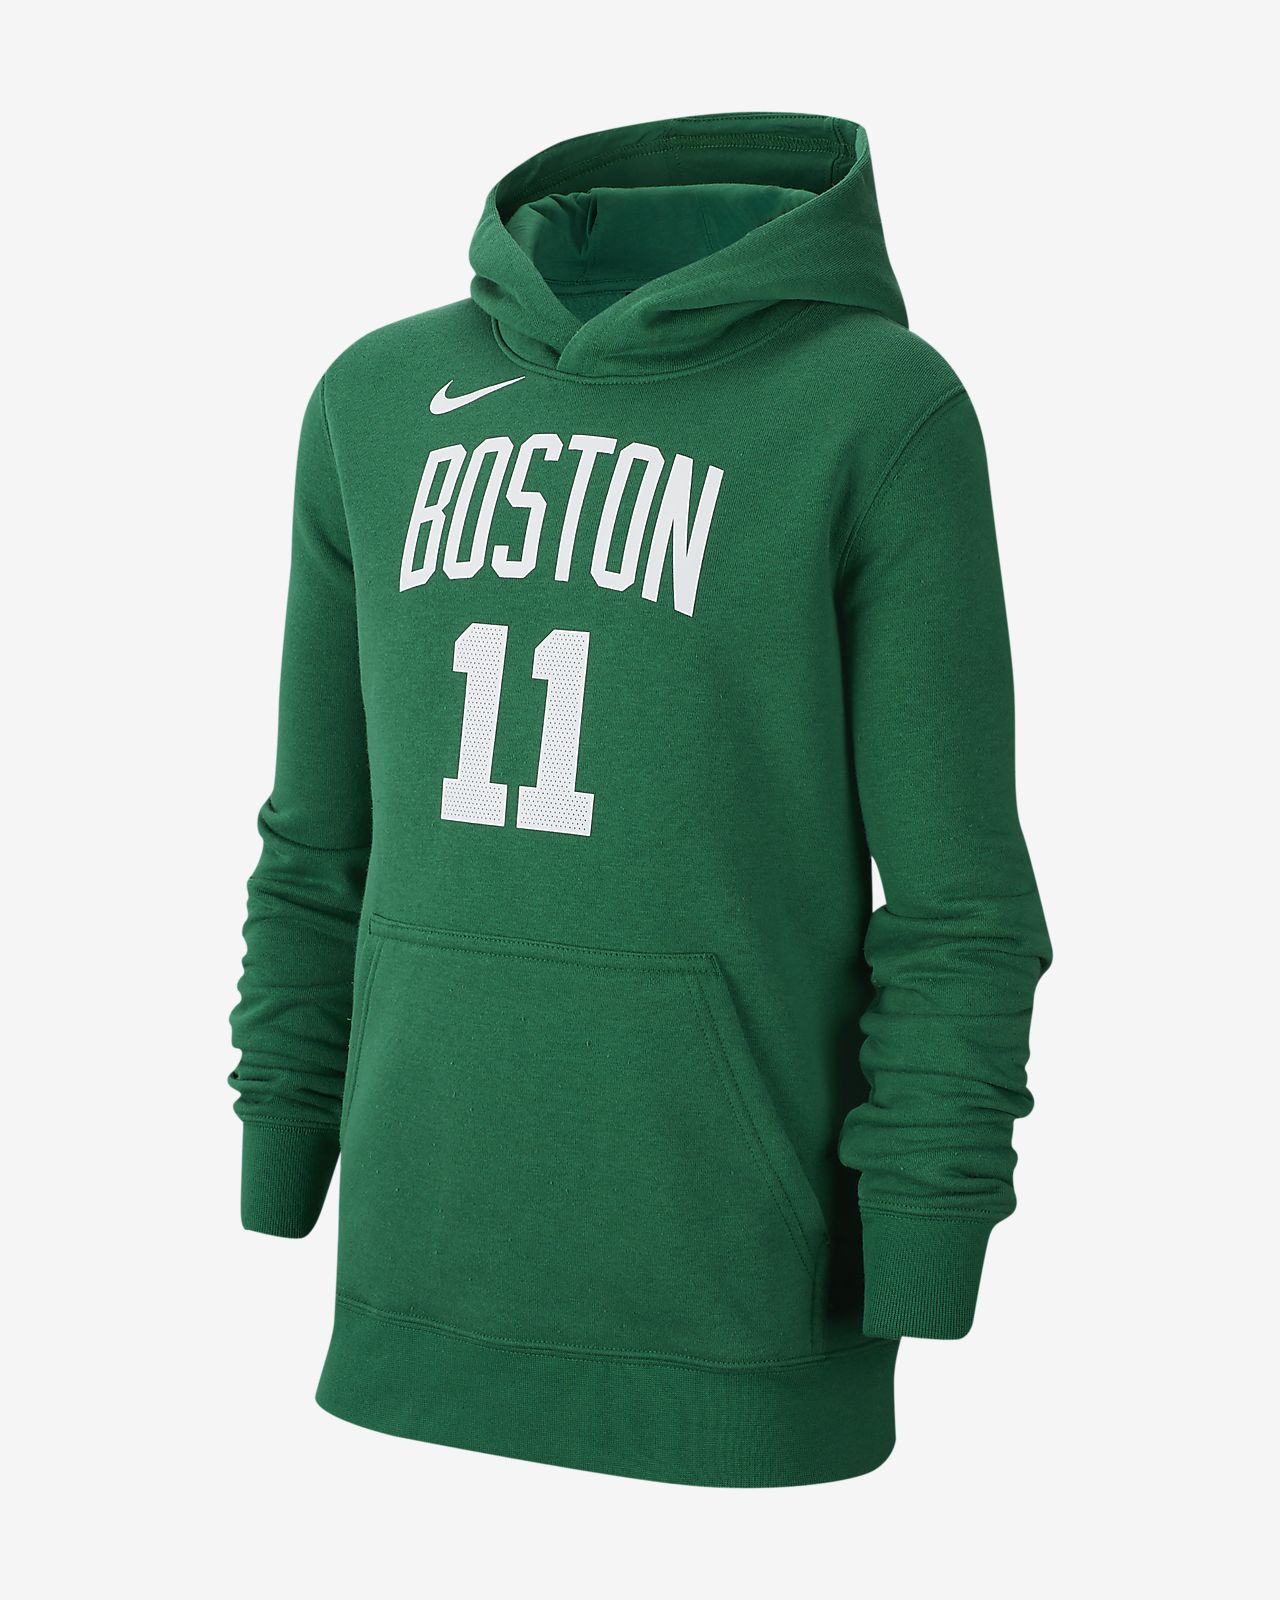 Kyrie Irving Boston Celtics Nike Big Kids' NBA Pullover Hoodie